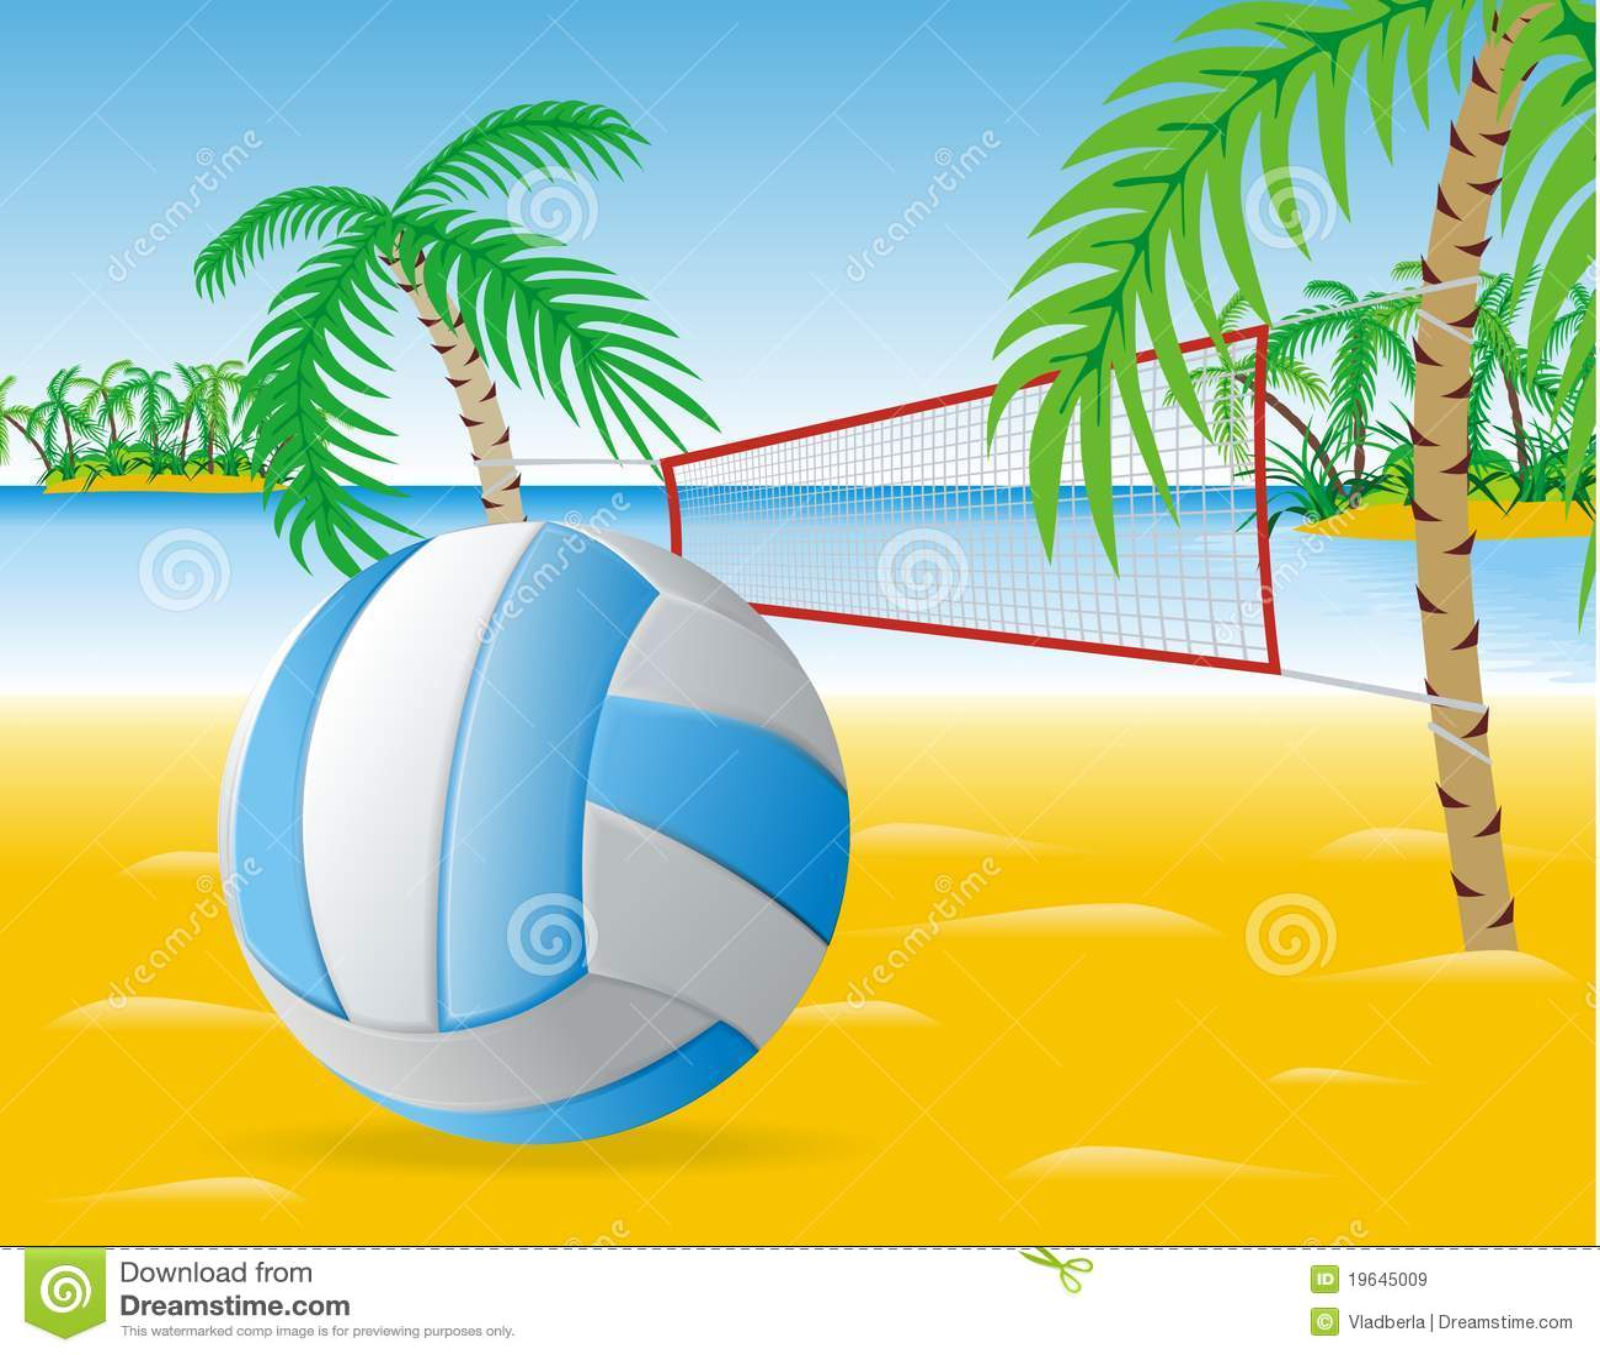 beach volleyball stock vector illustration of team recreation rh dreamstime com Beach Clip Art Beach Ball